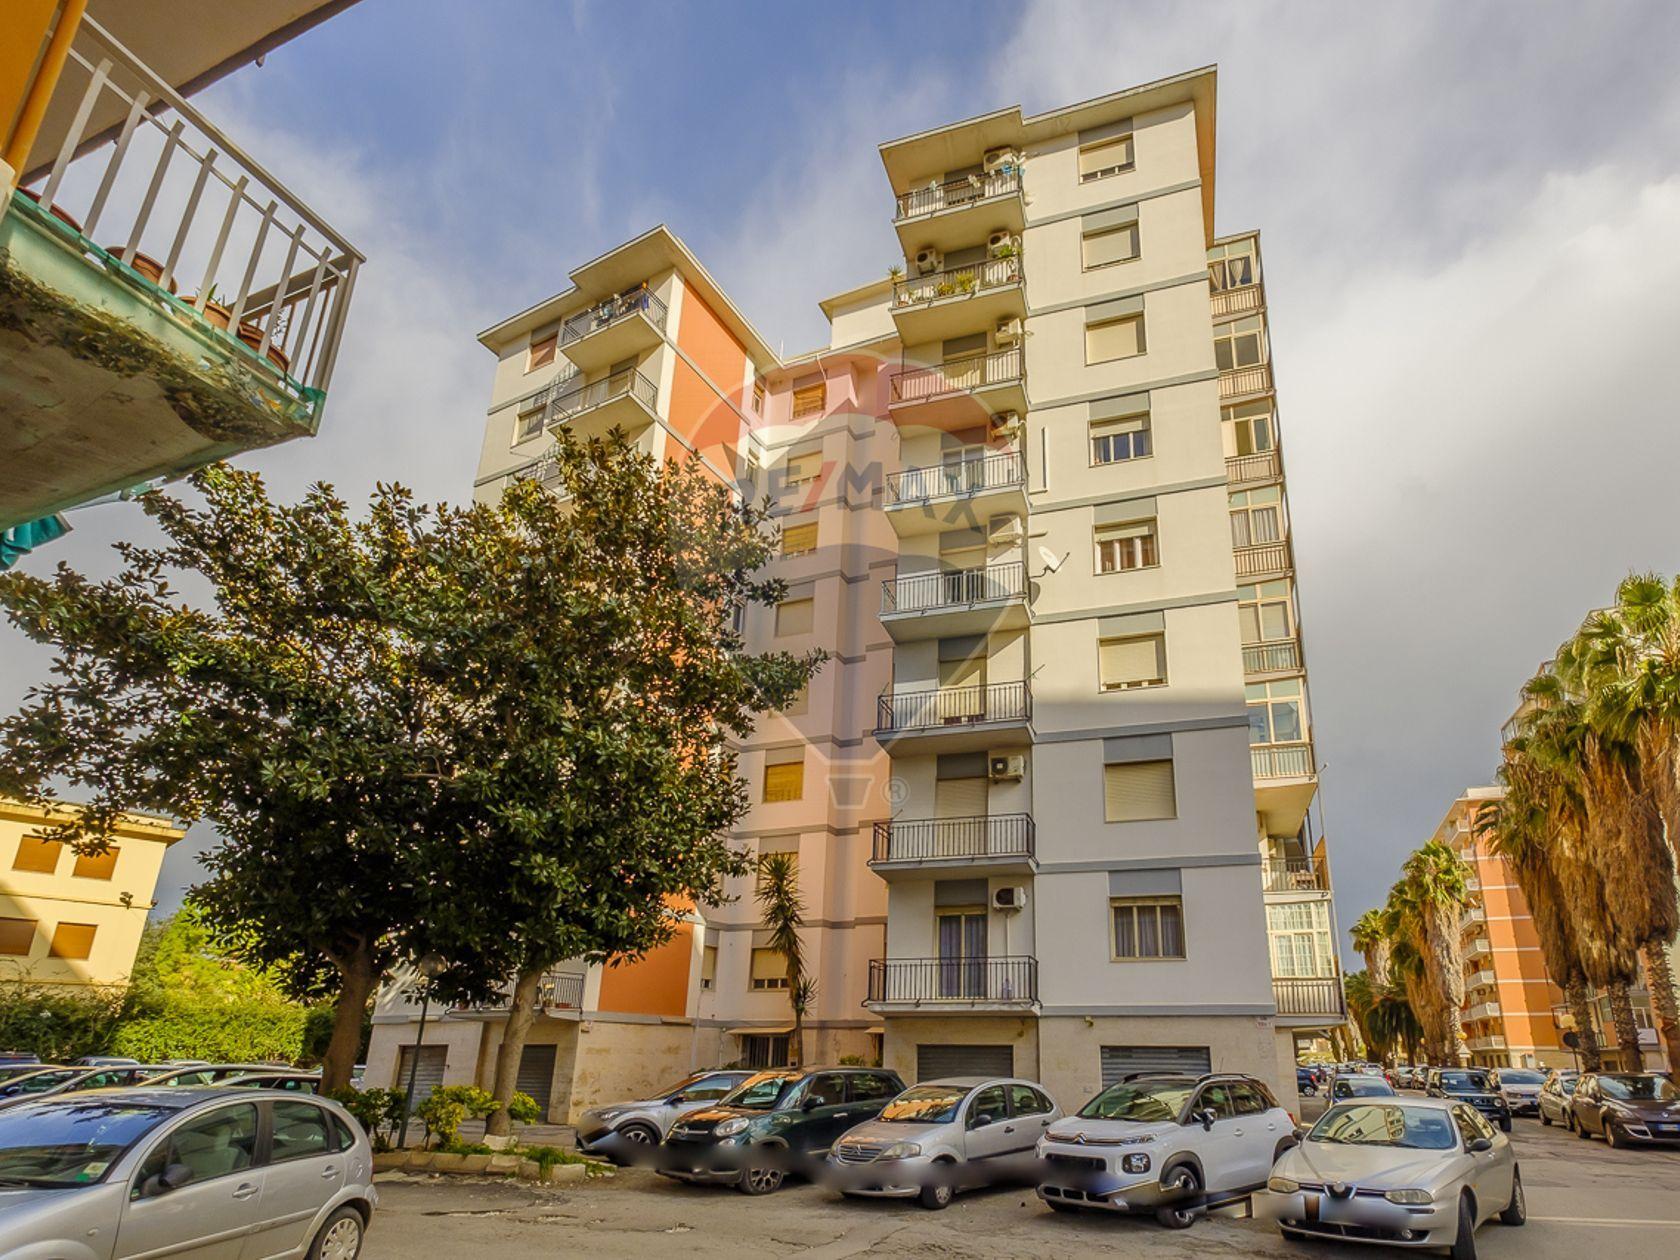 Appartamento Siracusa- Scala Greca S. Panagia Teracati Zecchino, Siracusa, SR Vendita - Foto 27